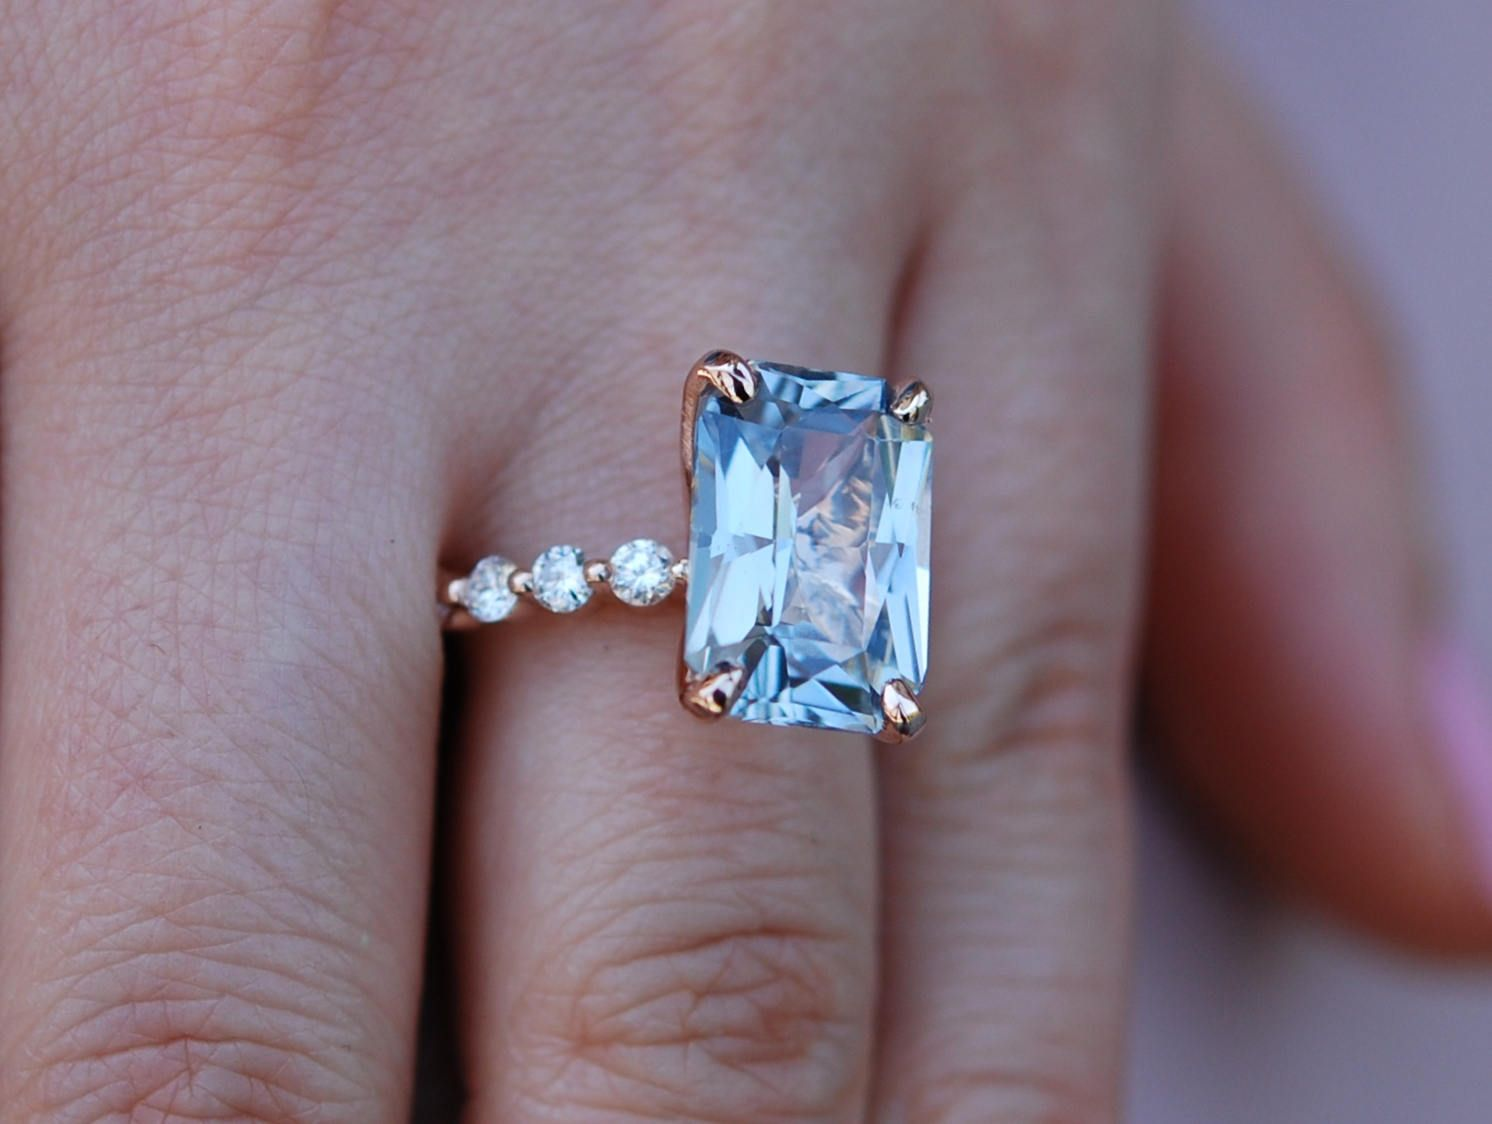 Large Of Blake Lively Engagement Ring